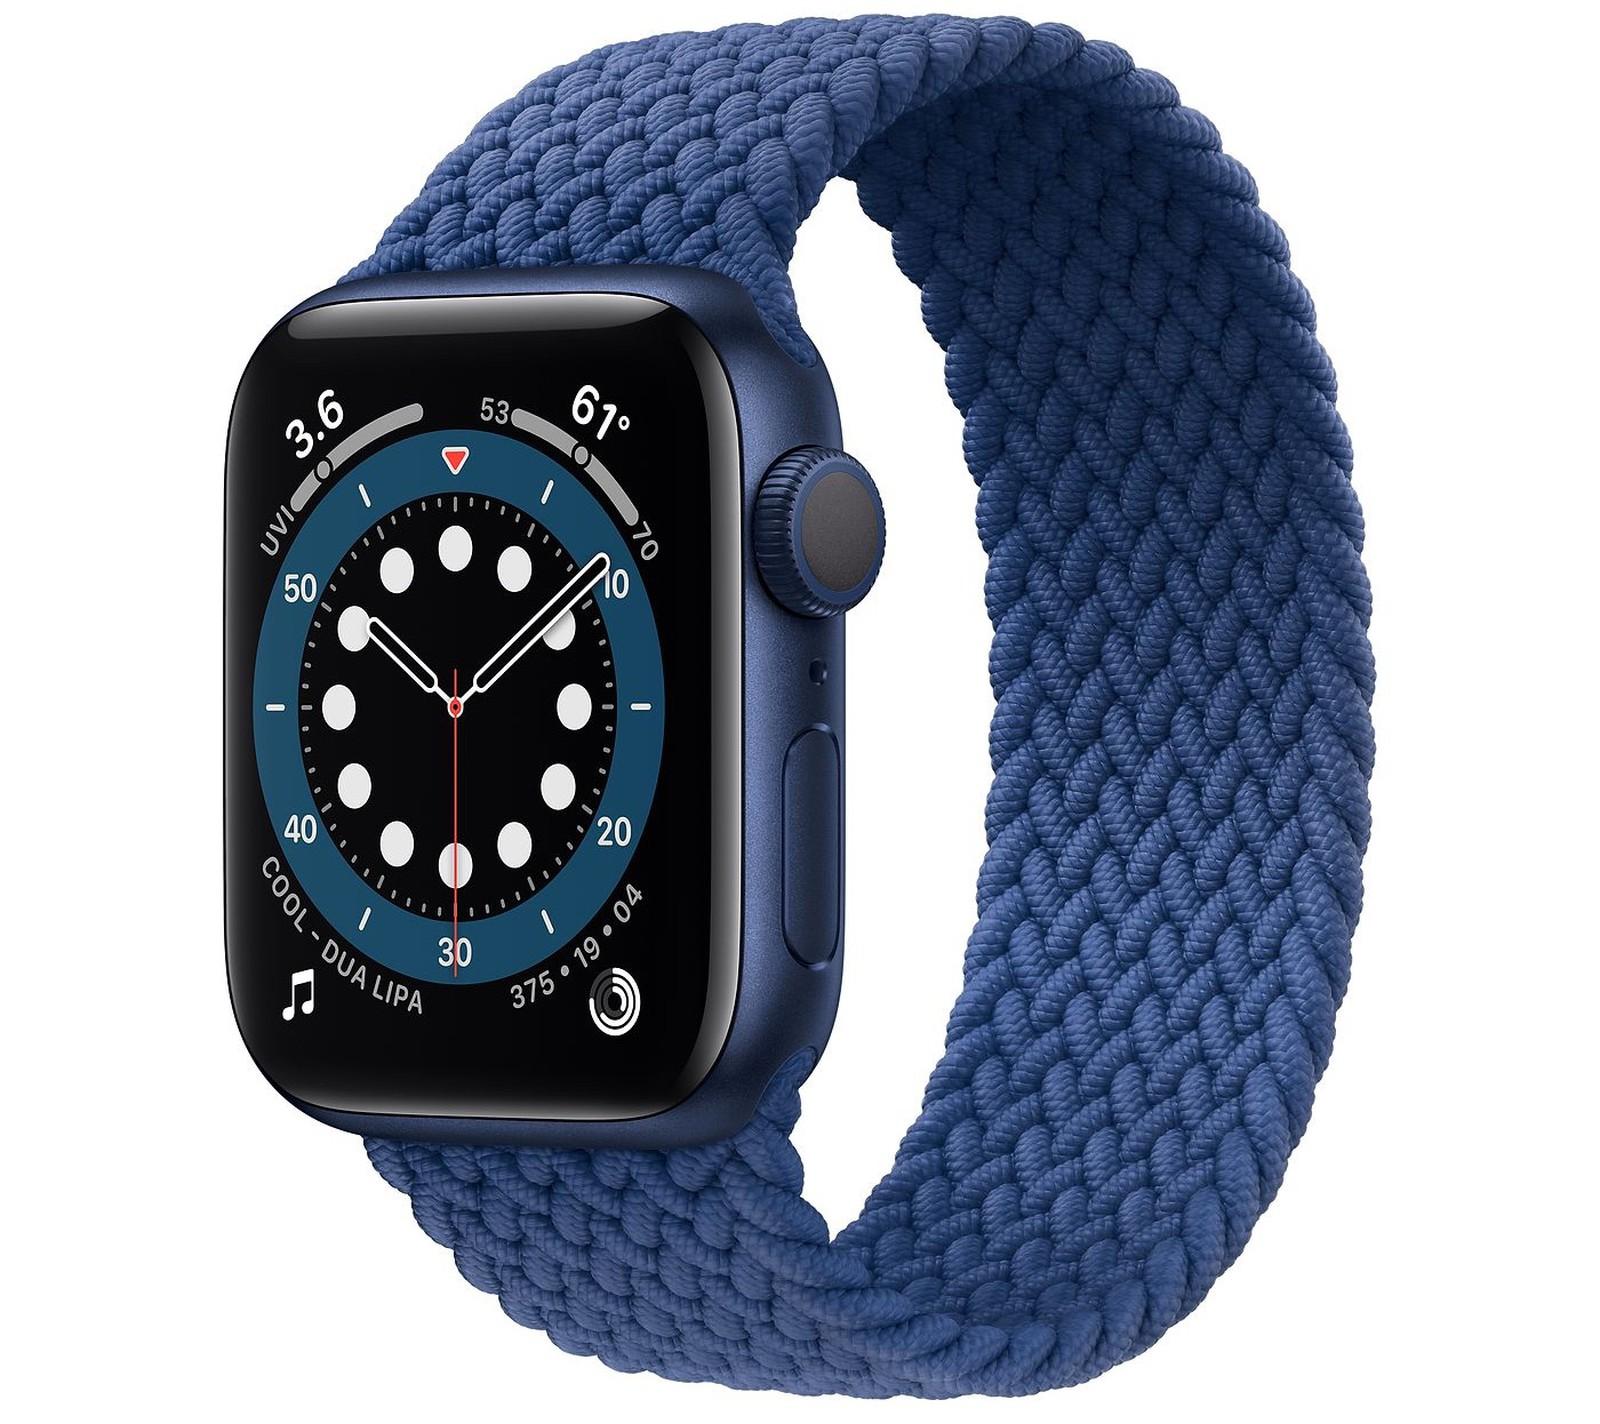 Apple Watch Seires 6 в темно-синем цвете